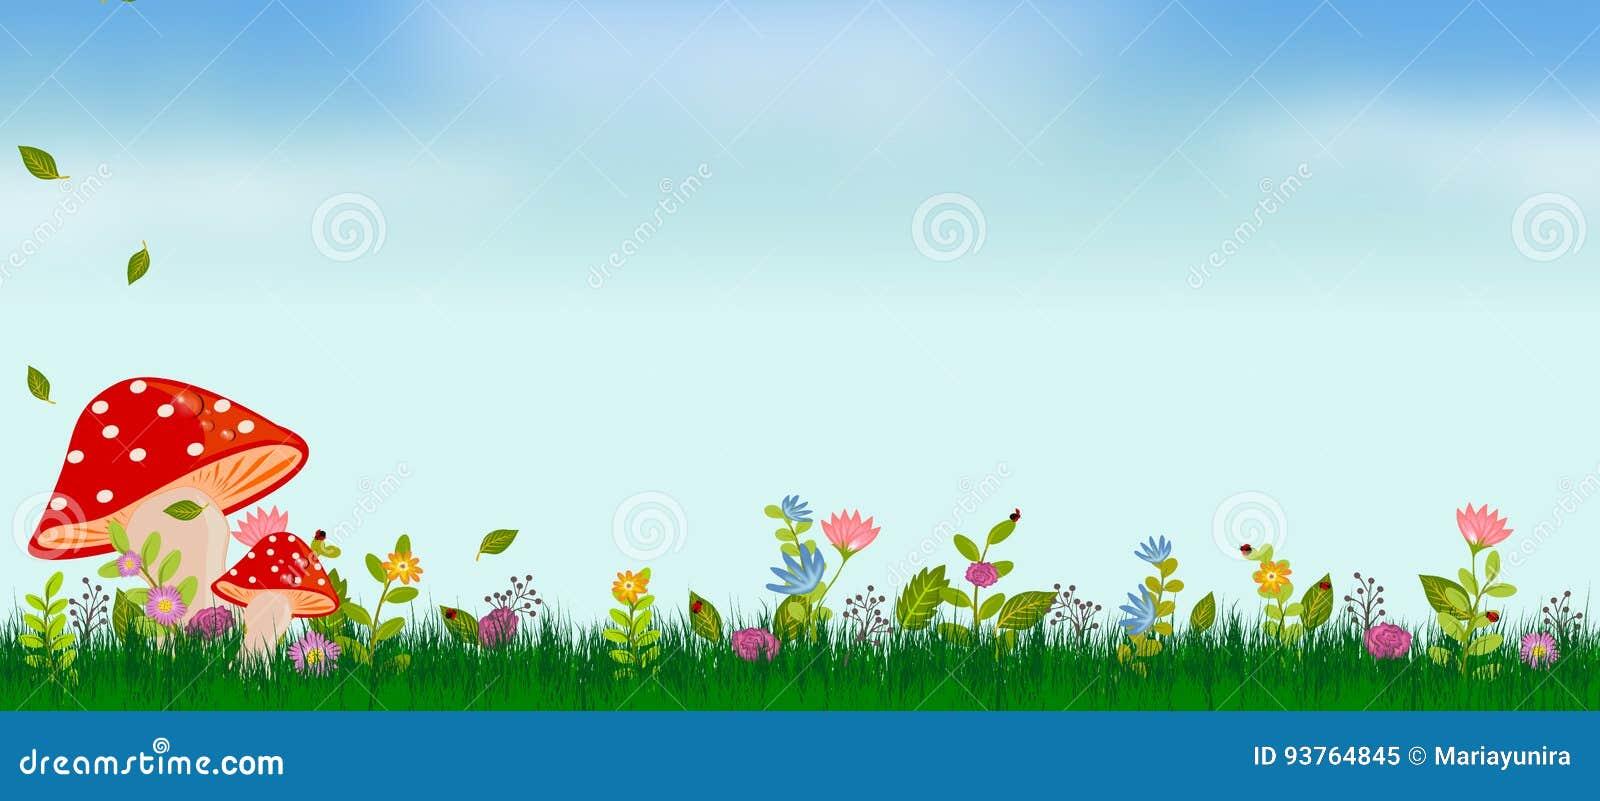 Spring summer background